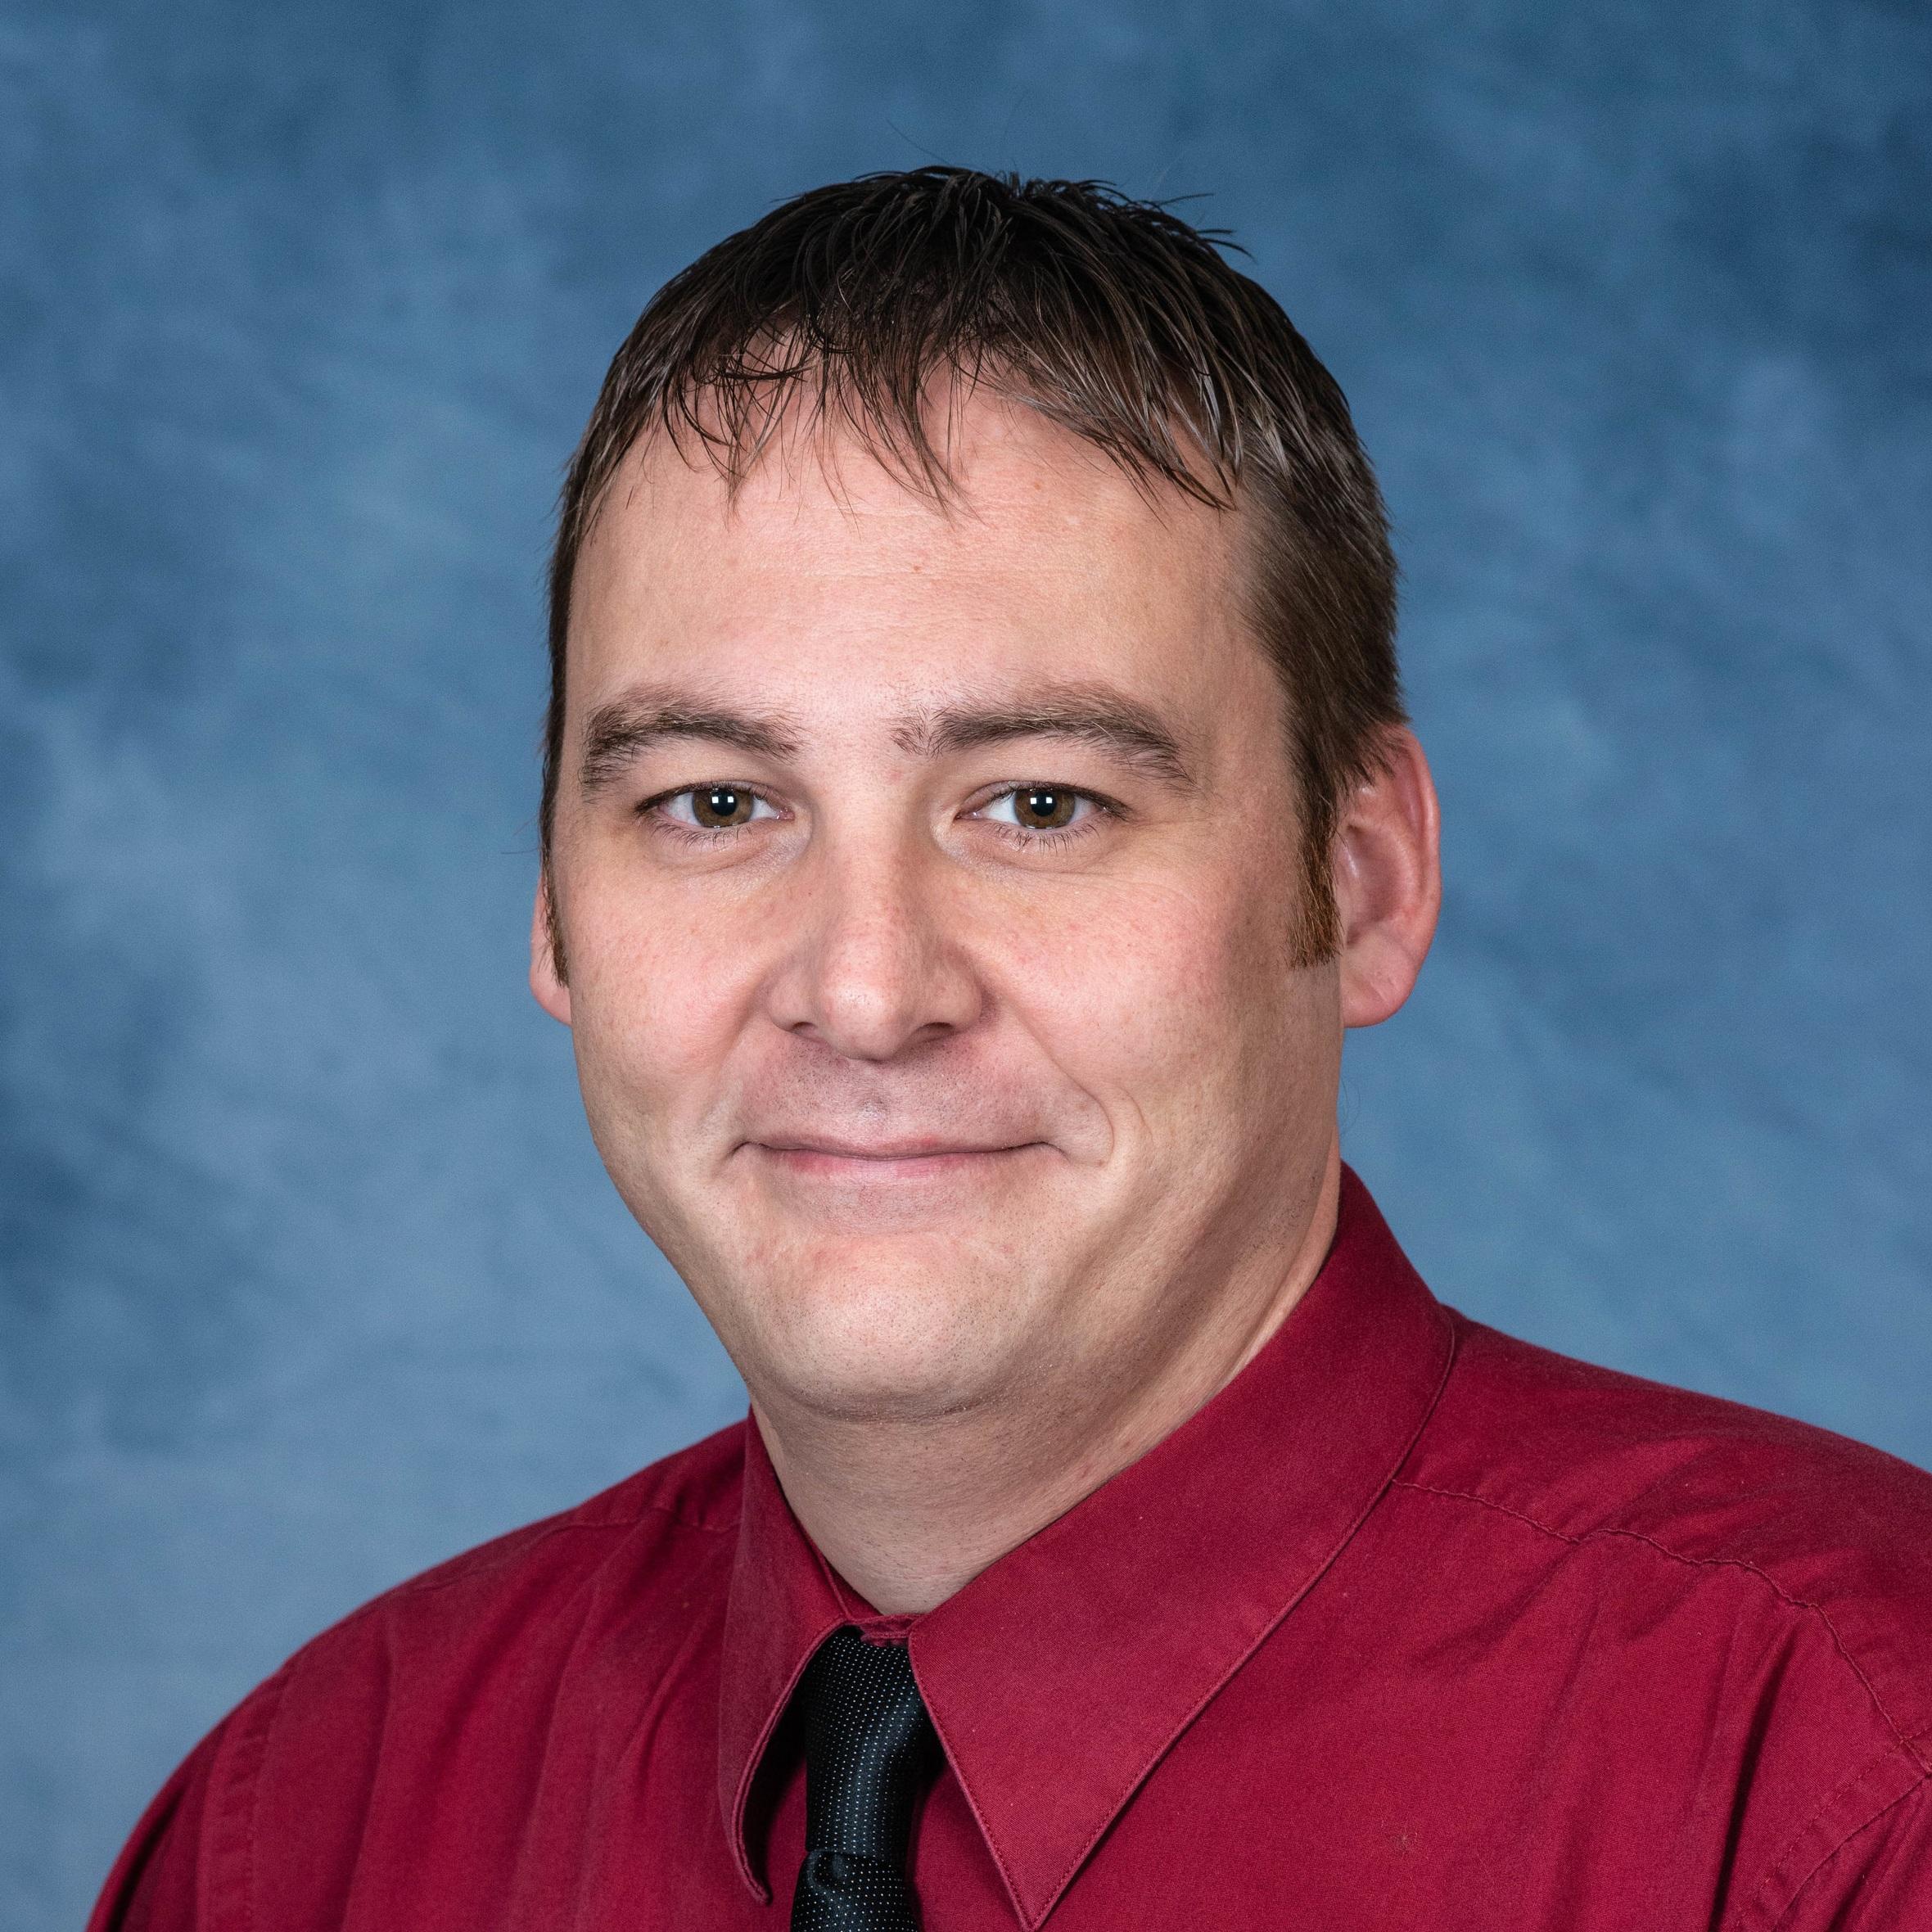 Josh Burgess - Facilities Management Directorjburgess@tendermerciesinc.org513-639-7022